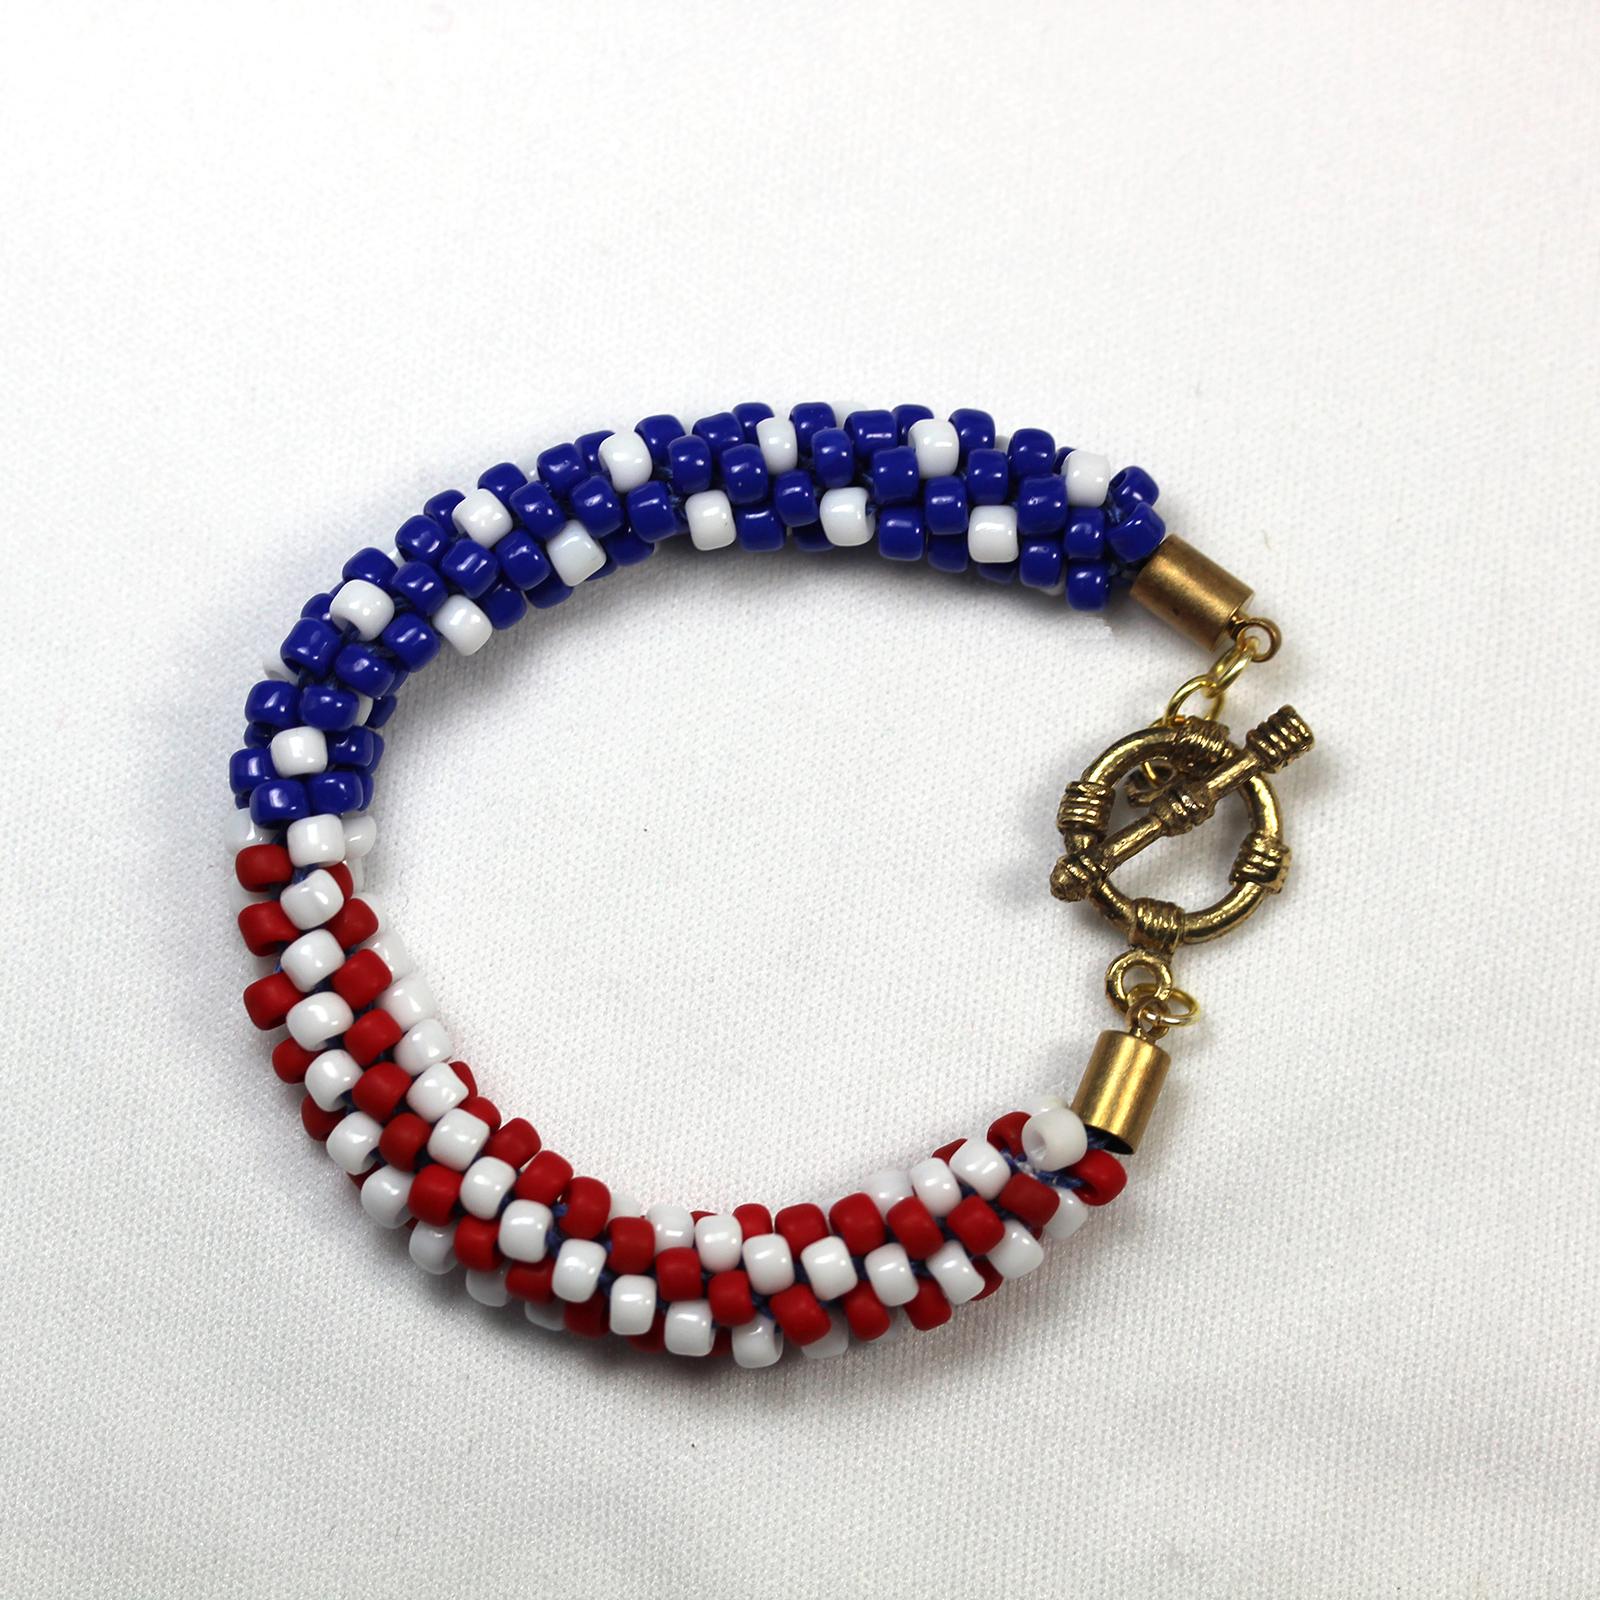 Designer Jewelry - KumihimoAmericaFlagwStripesPattern